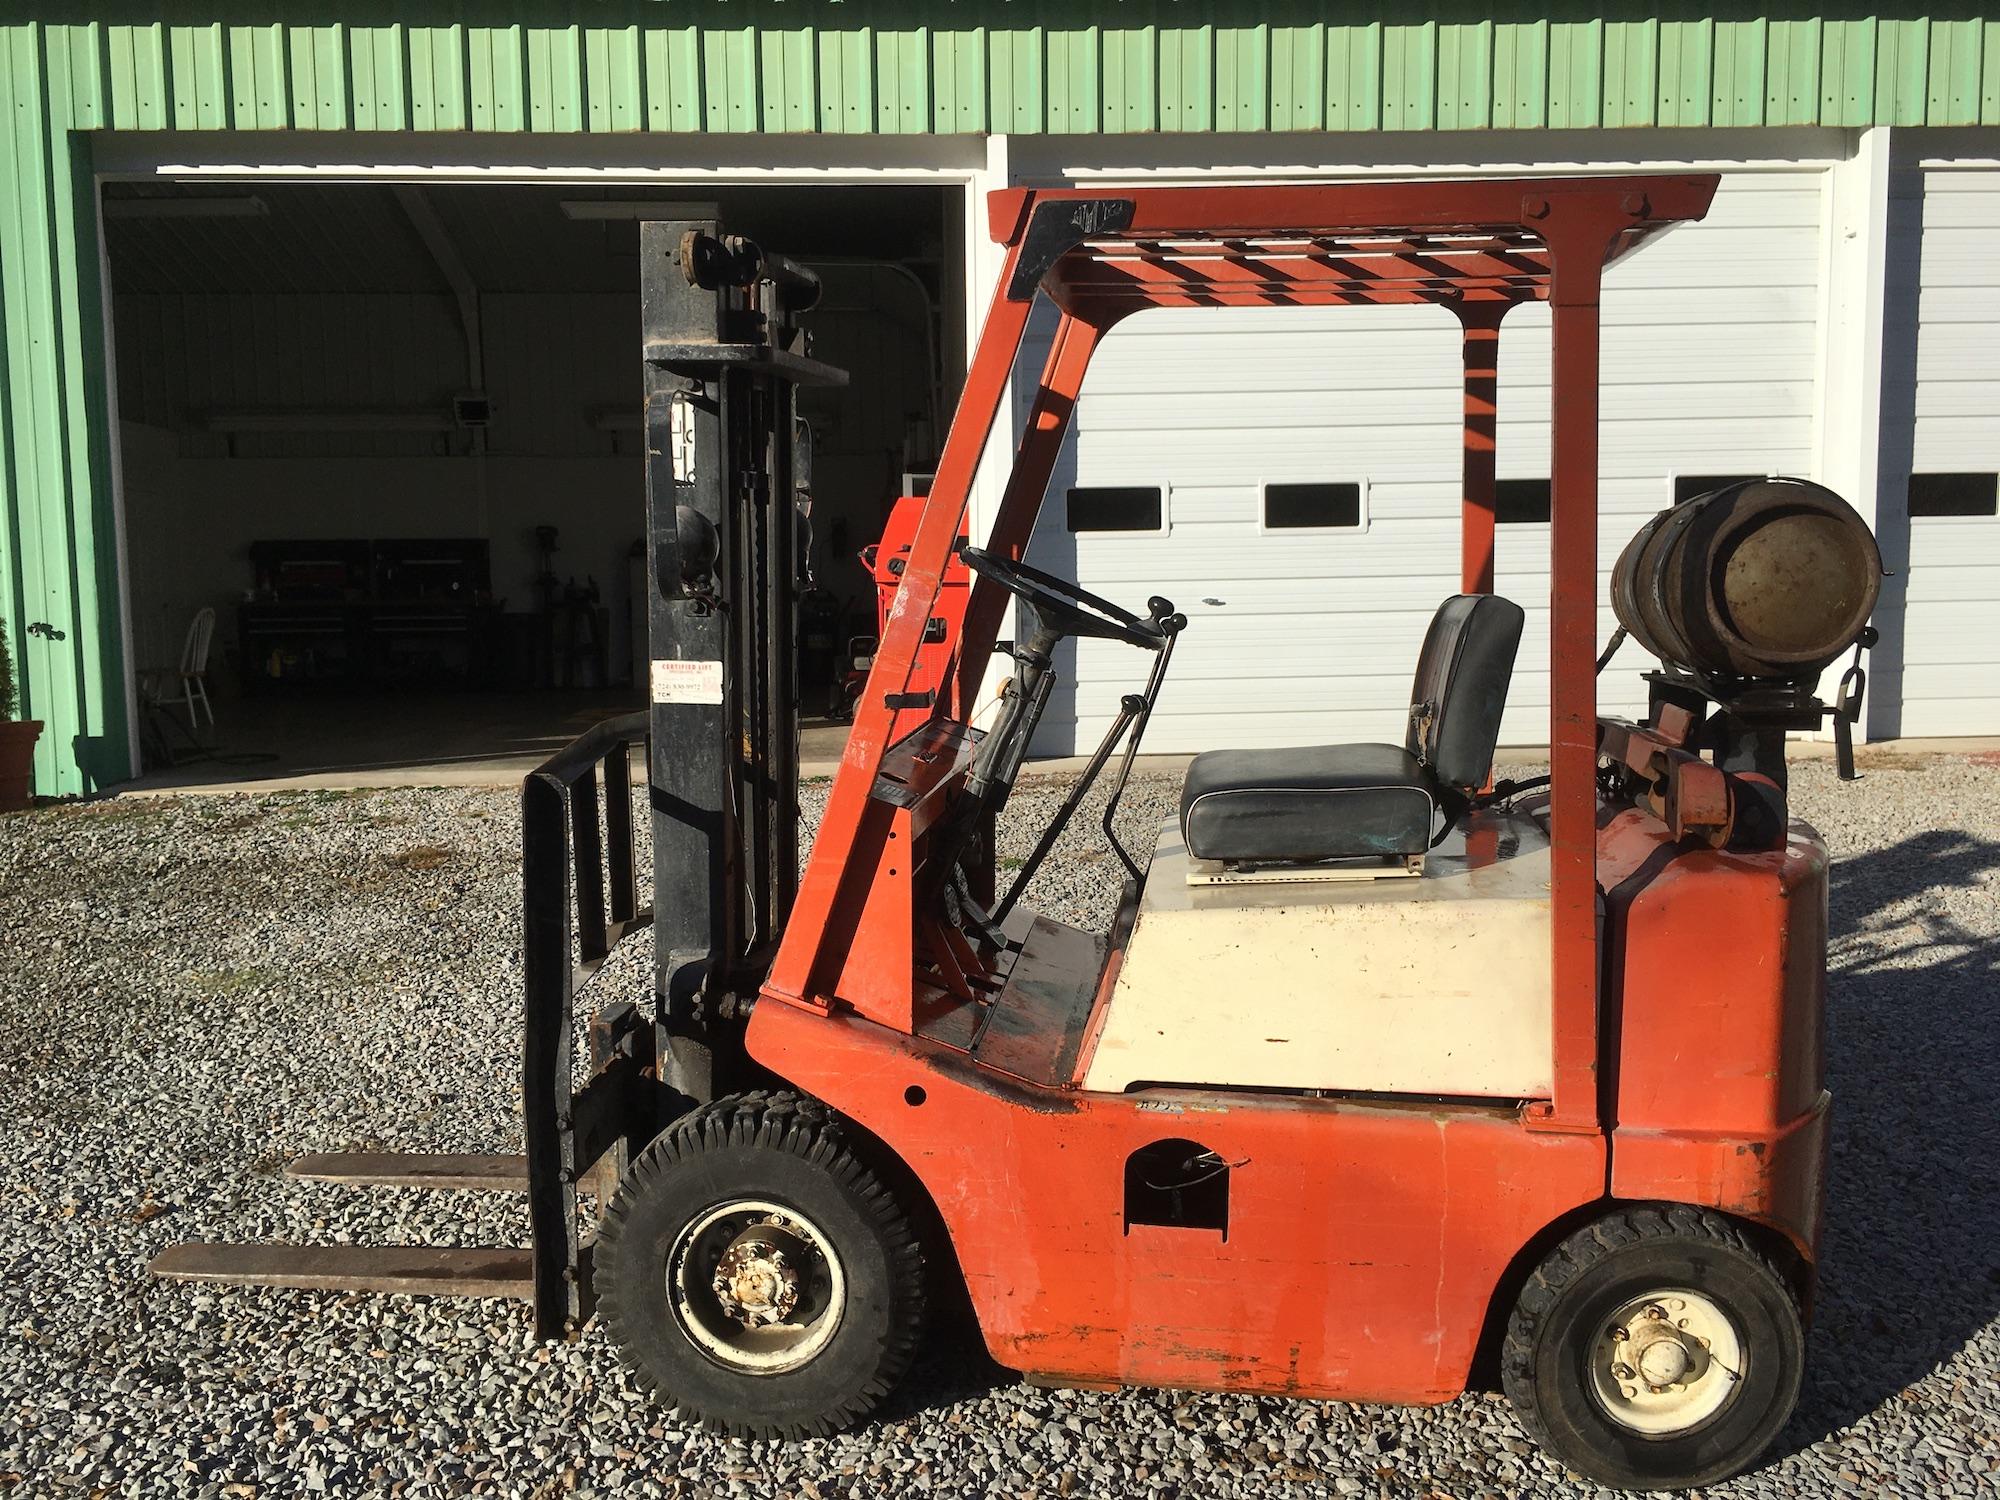 TCM-M300257-Forklift-02